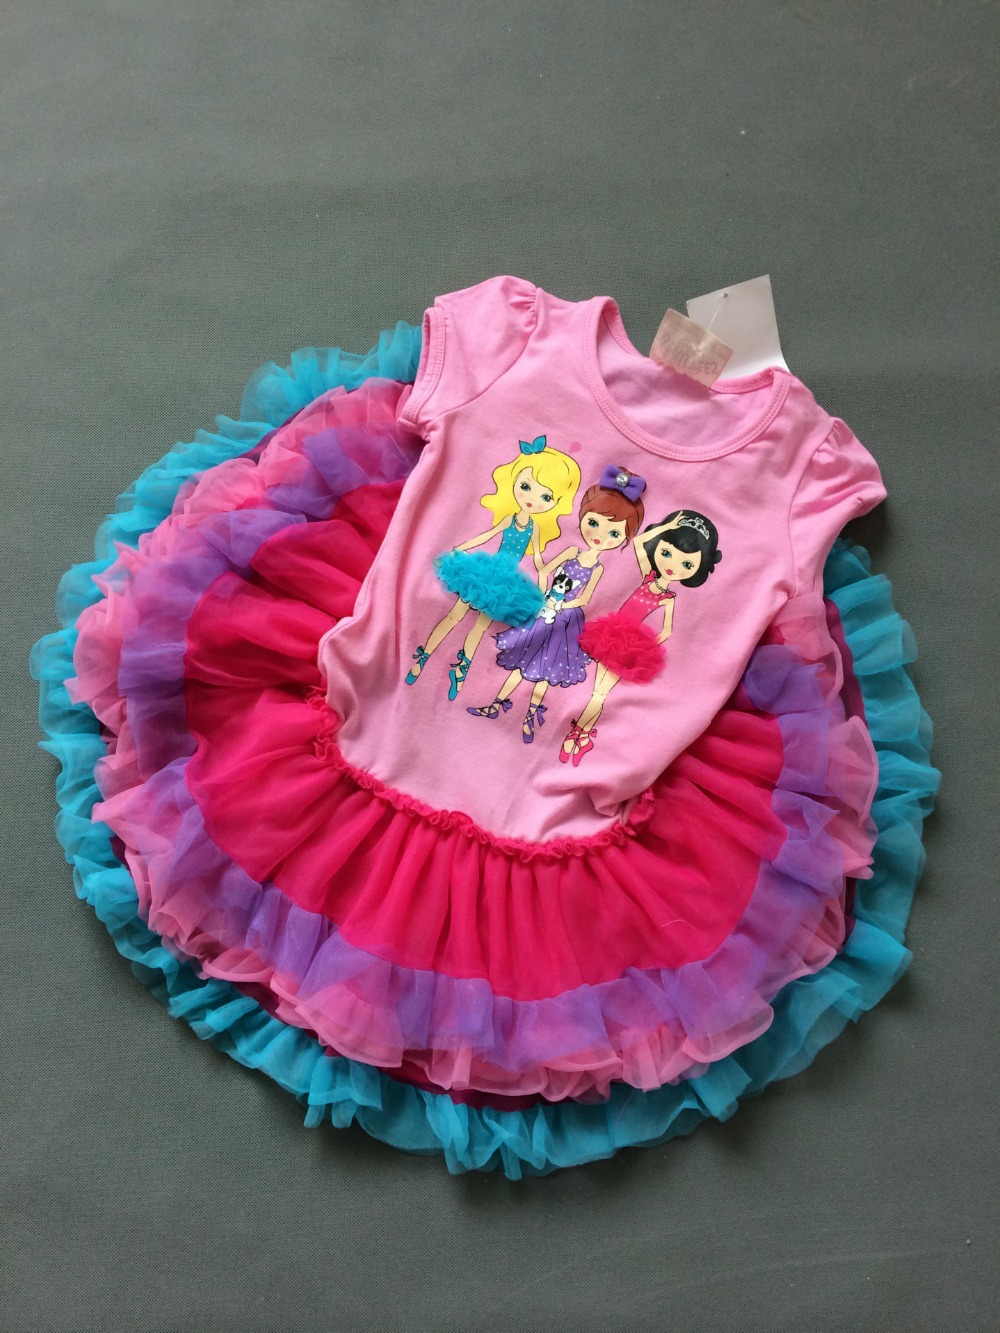 ROCOO original beautees 6pieces/lot 2-4 girls yarn decoration tulle summer dress Super nice 3D yarn tutu dress<br><br>Aliexpress